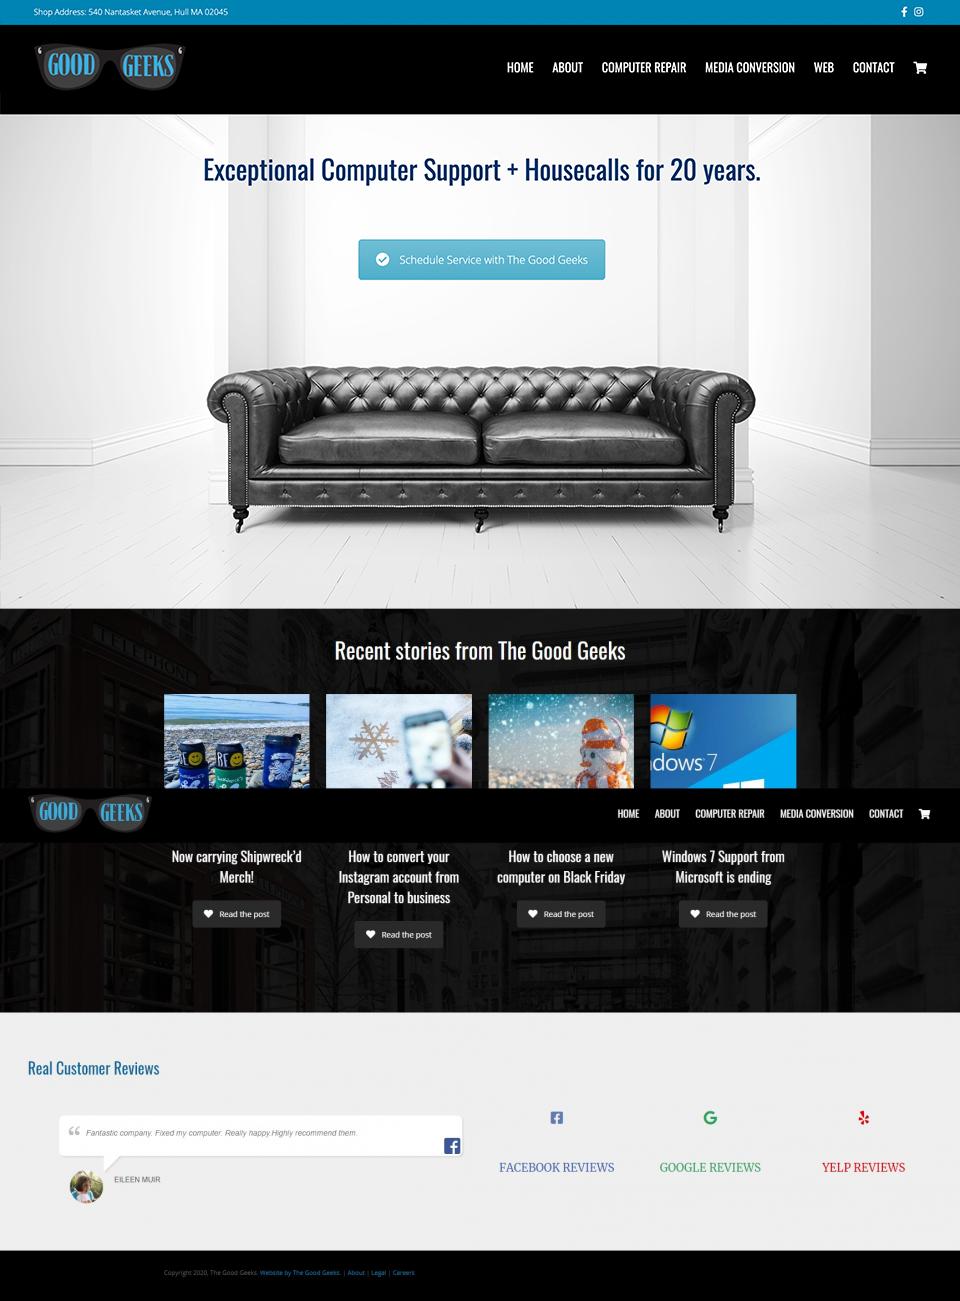 screenshot of good geeks computer repair website